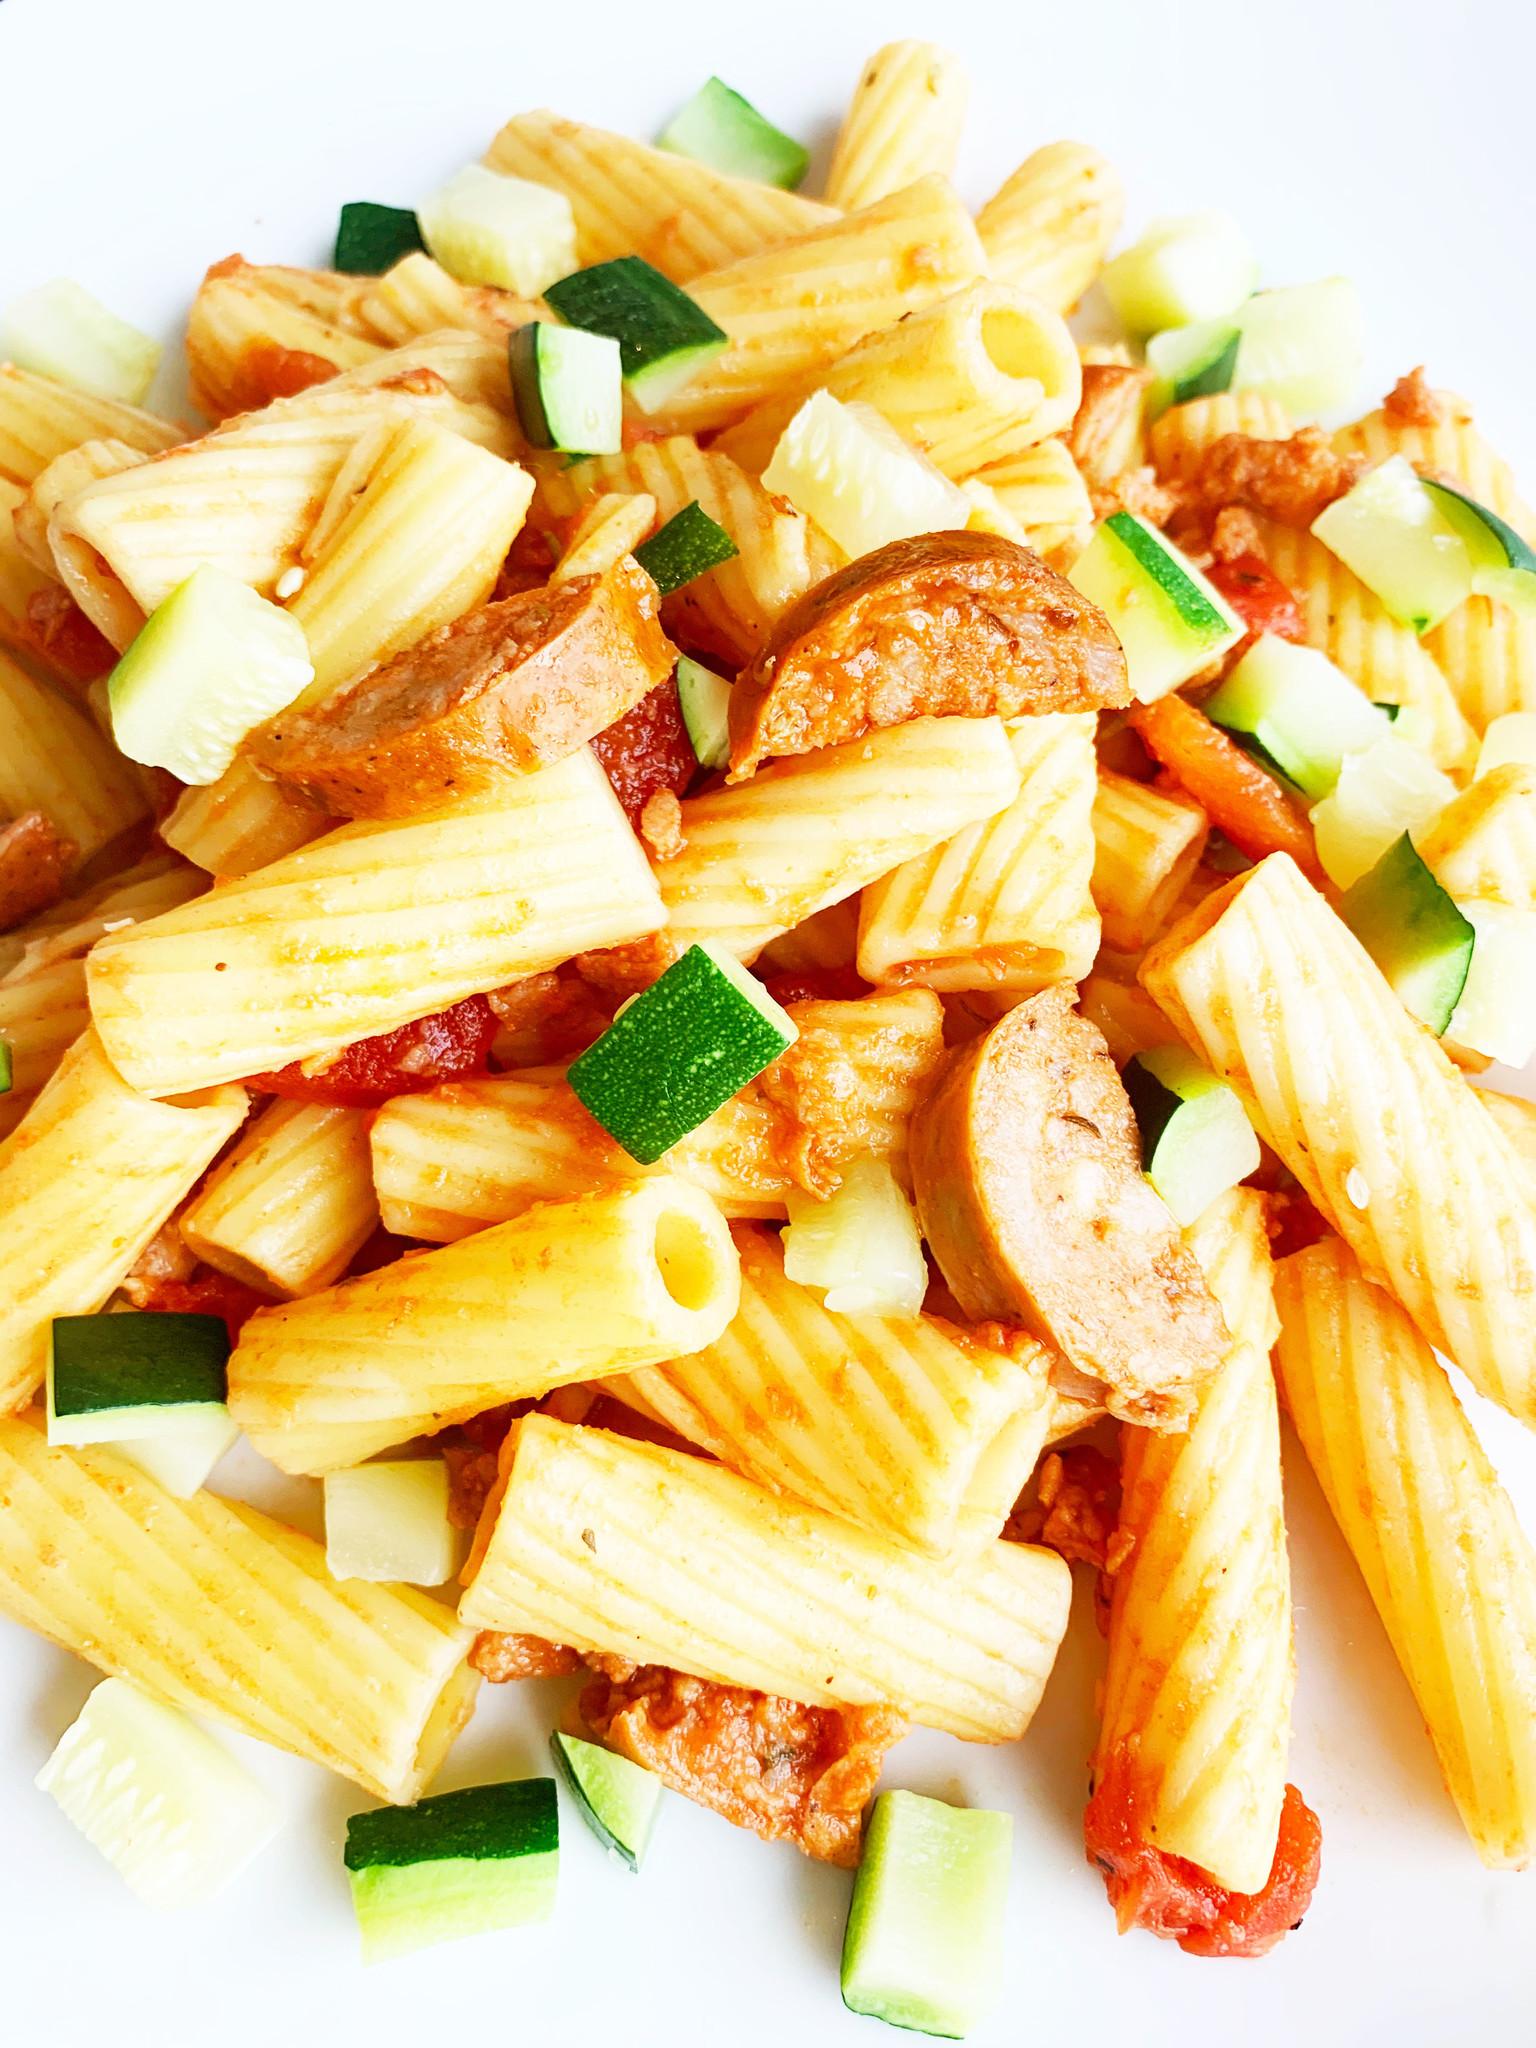 Rigatoni, saucisse italienne & courge verte (325g)